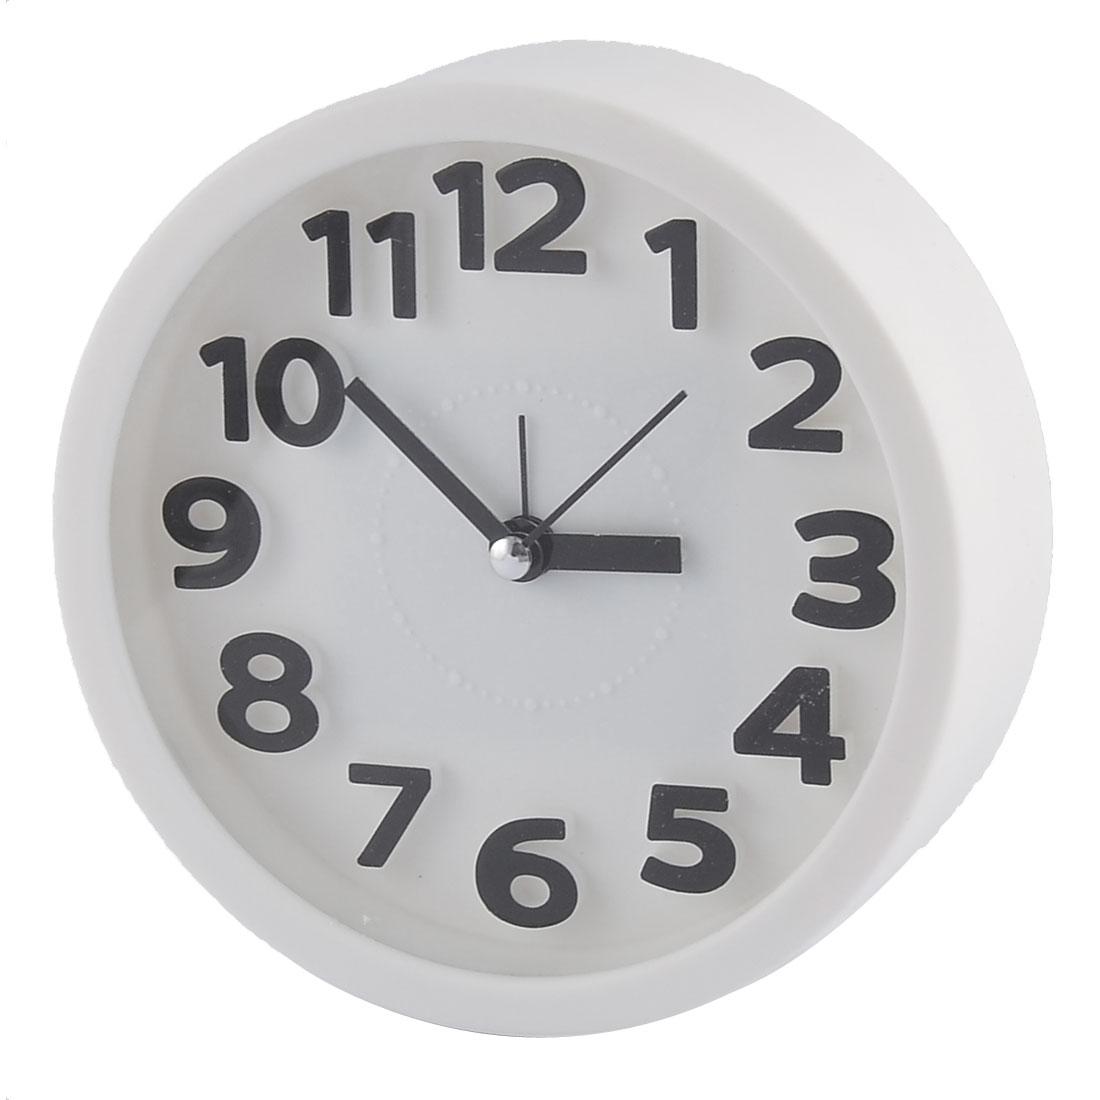 Household Office Desktop Plastic Round Silent Battery Powered Arabic Number Alarm Clock White